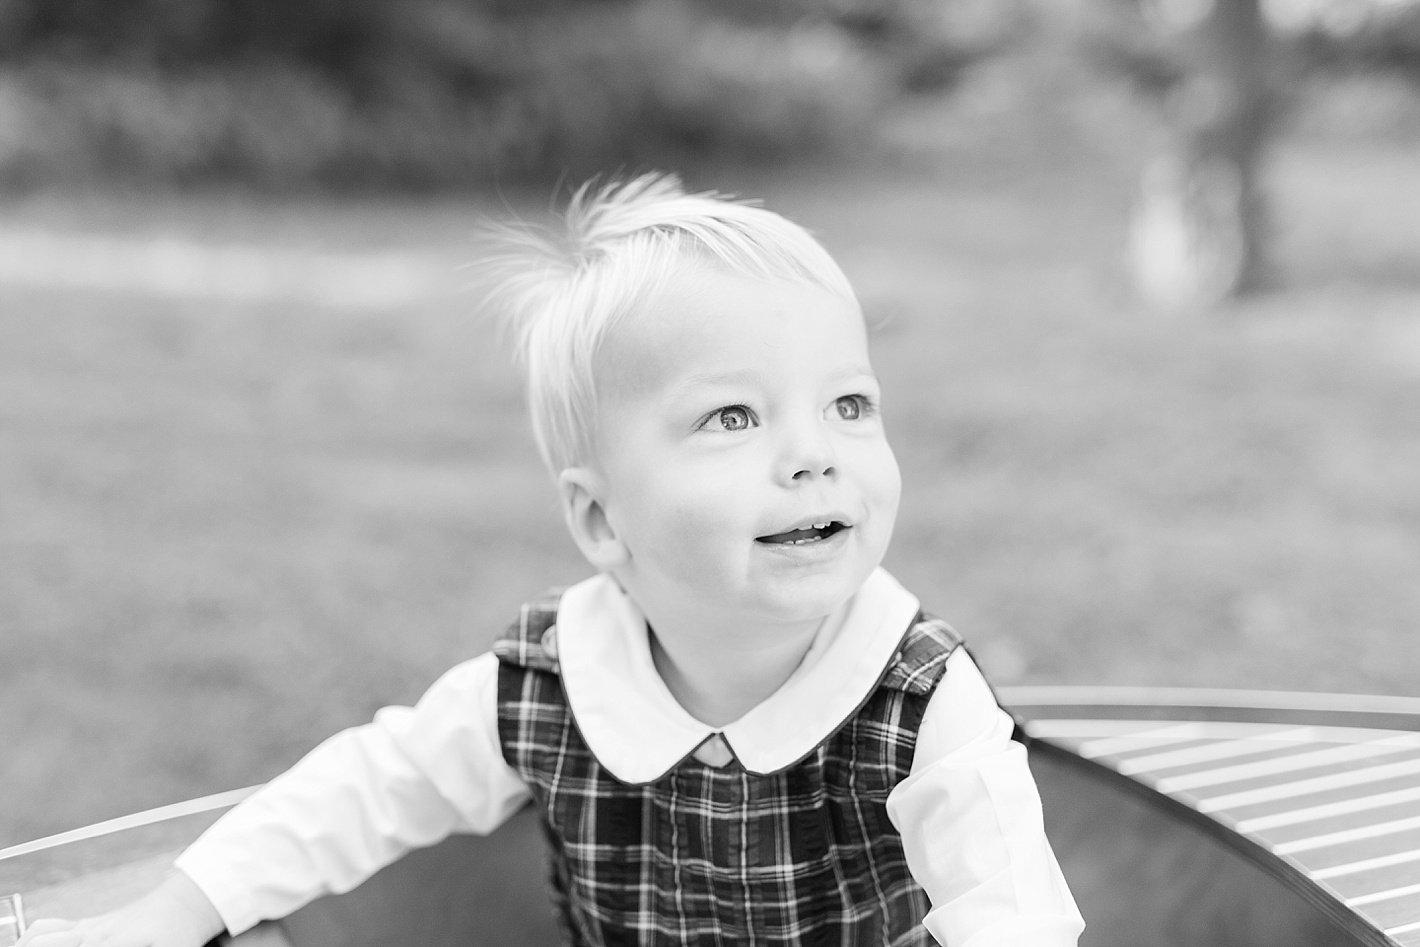 Howard_County_family_photographer_arpasi_photography-7